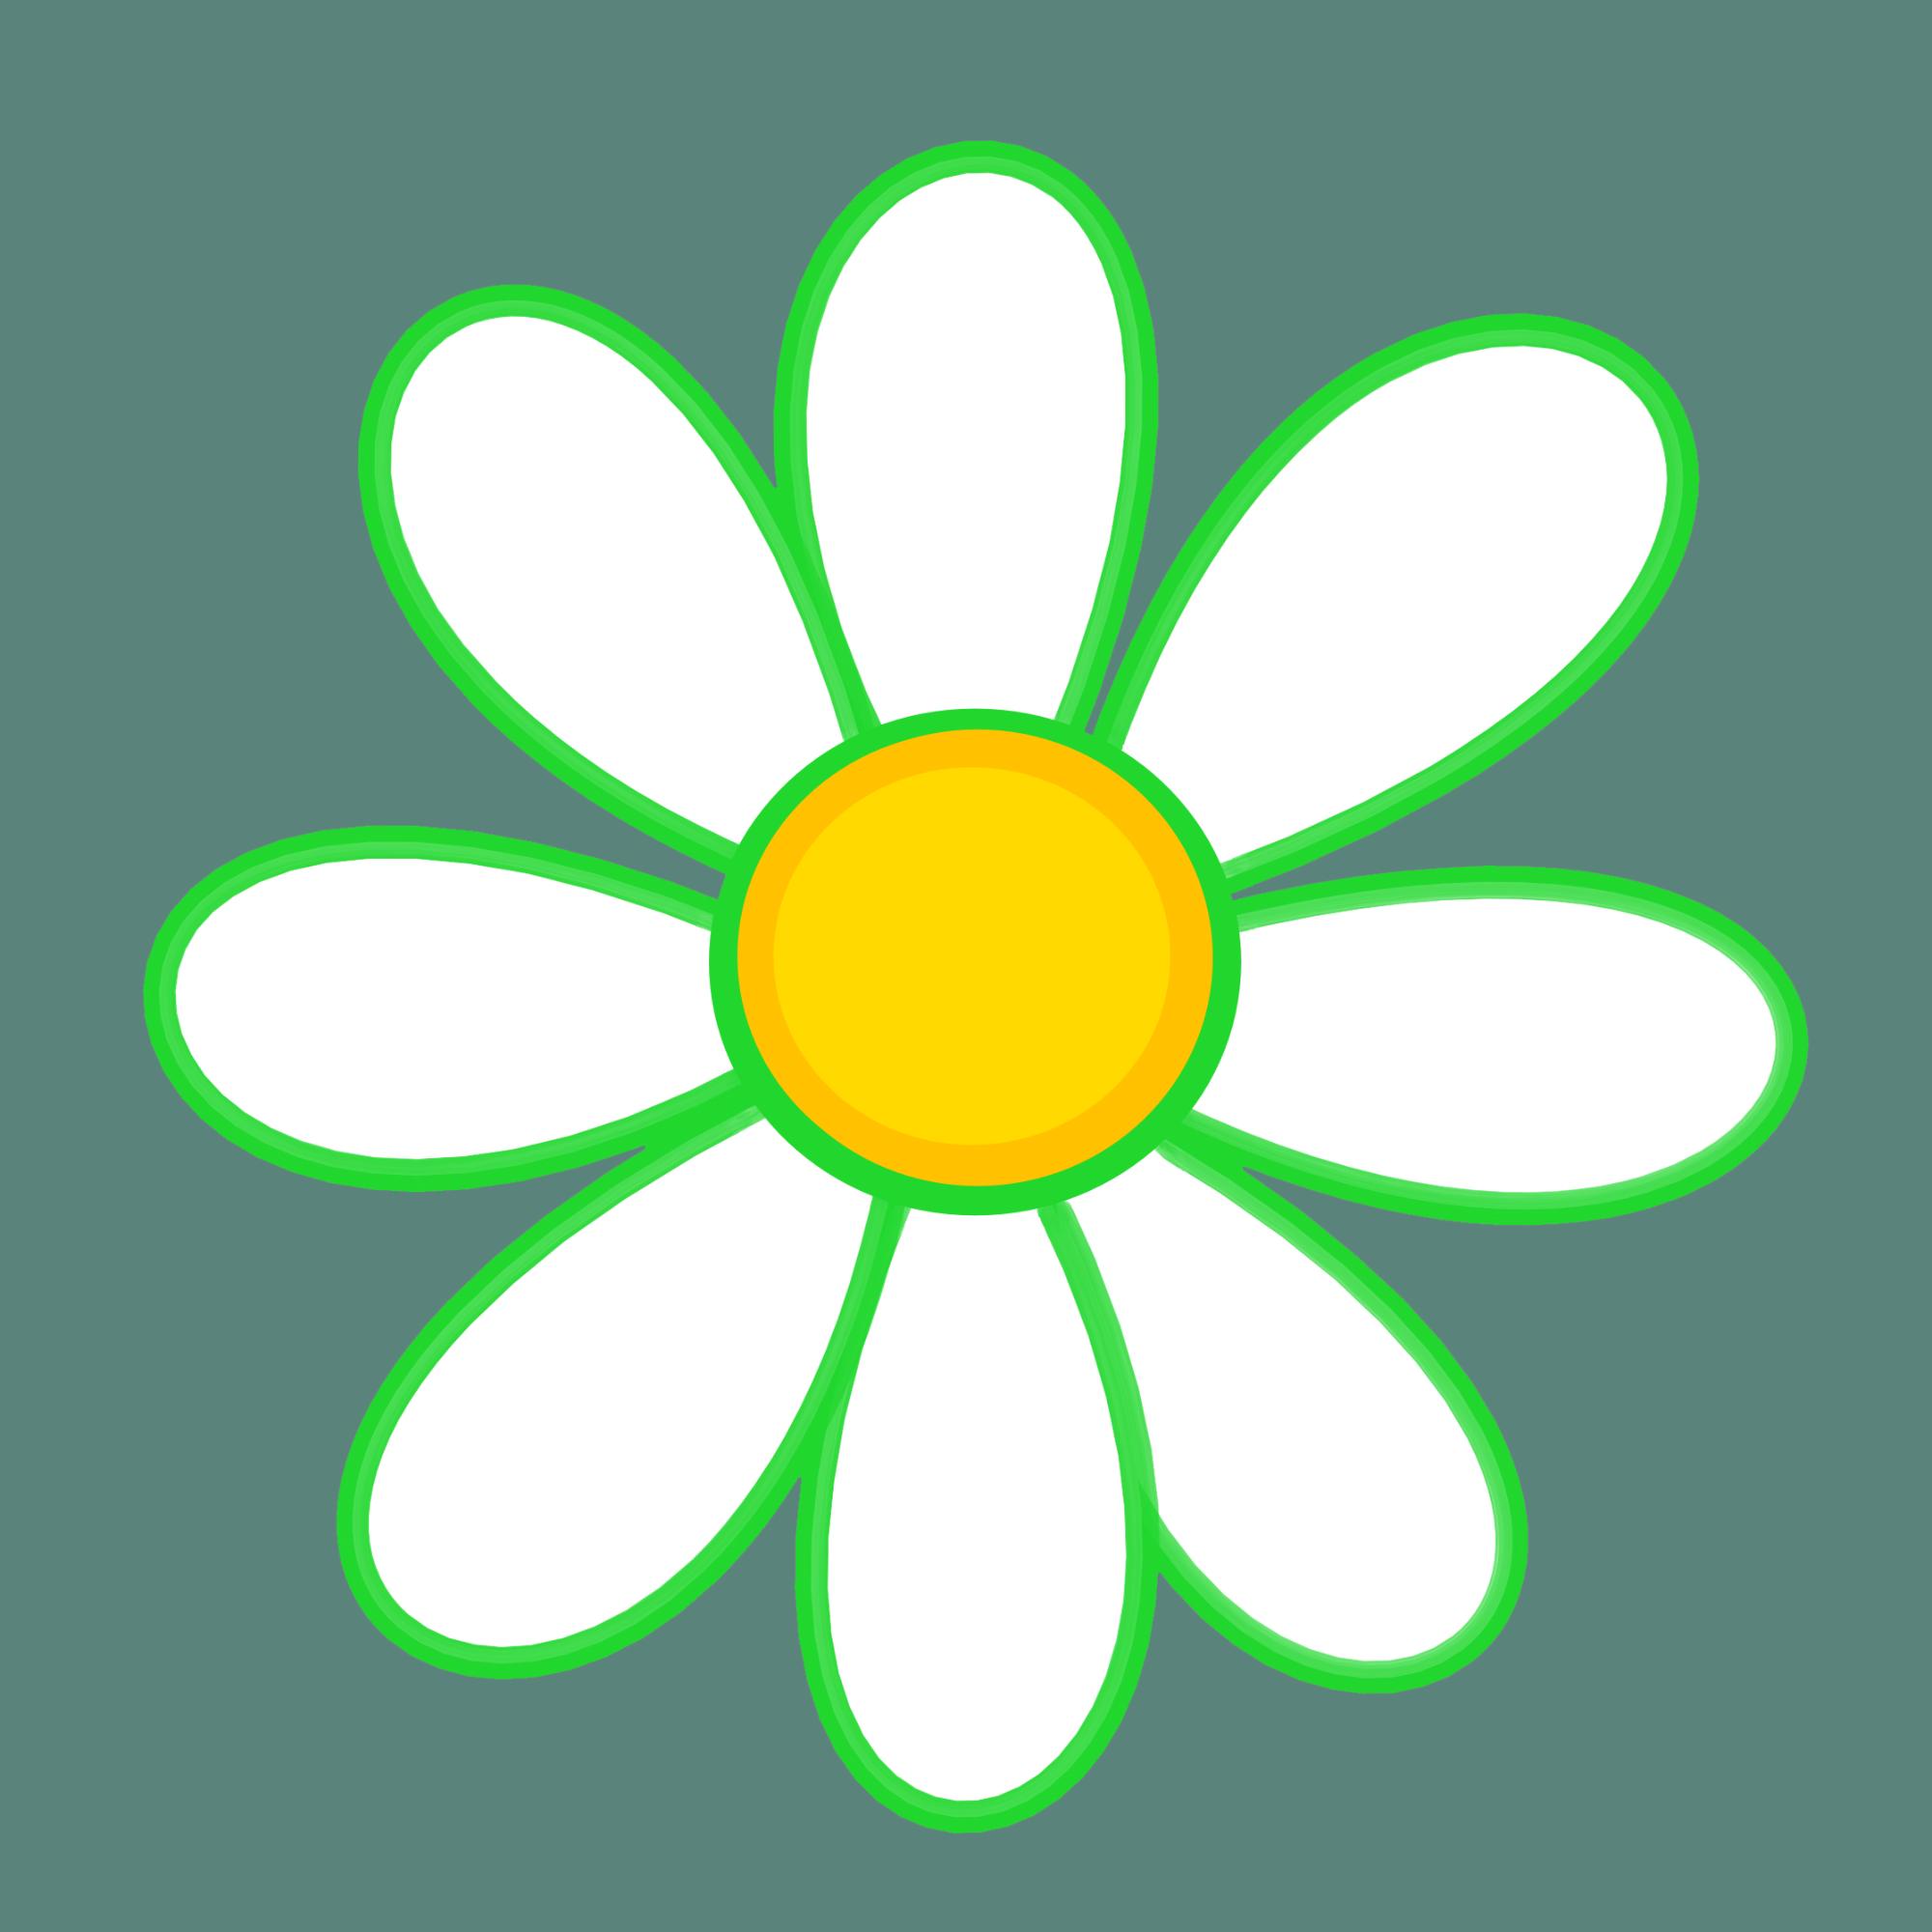 V-Eco Home daisy logo